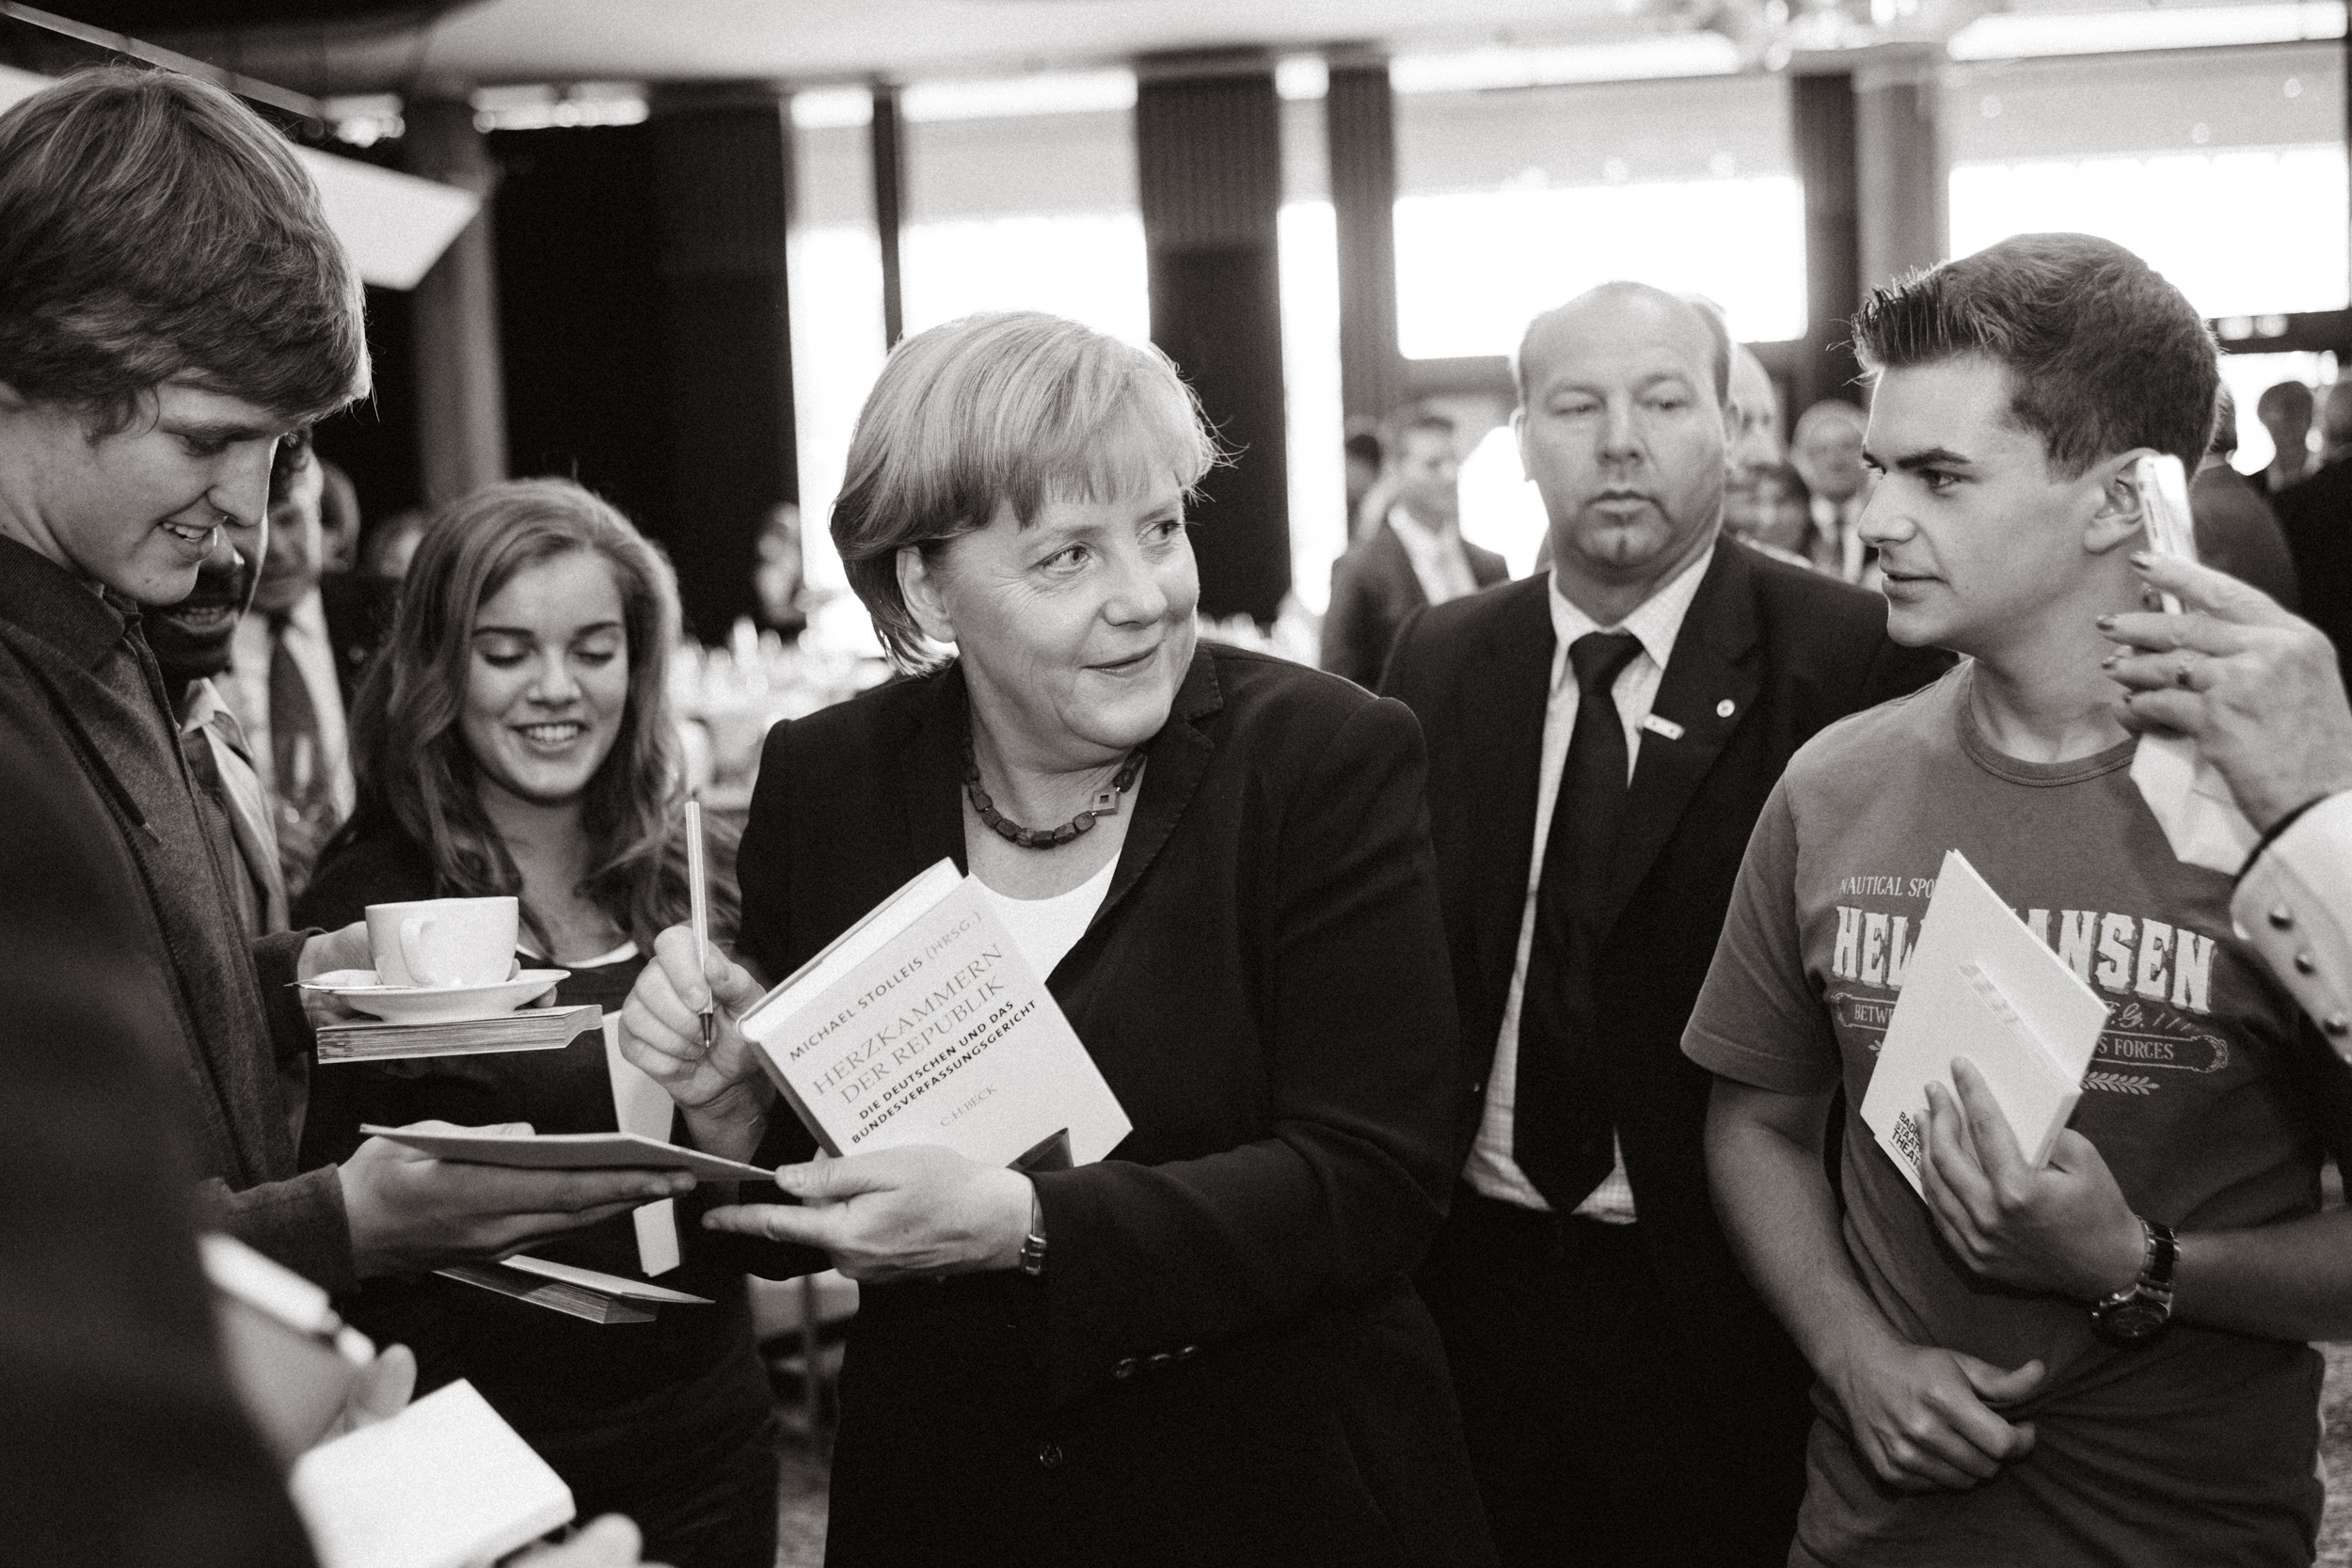 : Angela Merkel - German chancellor